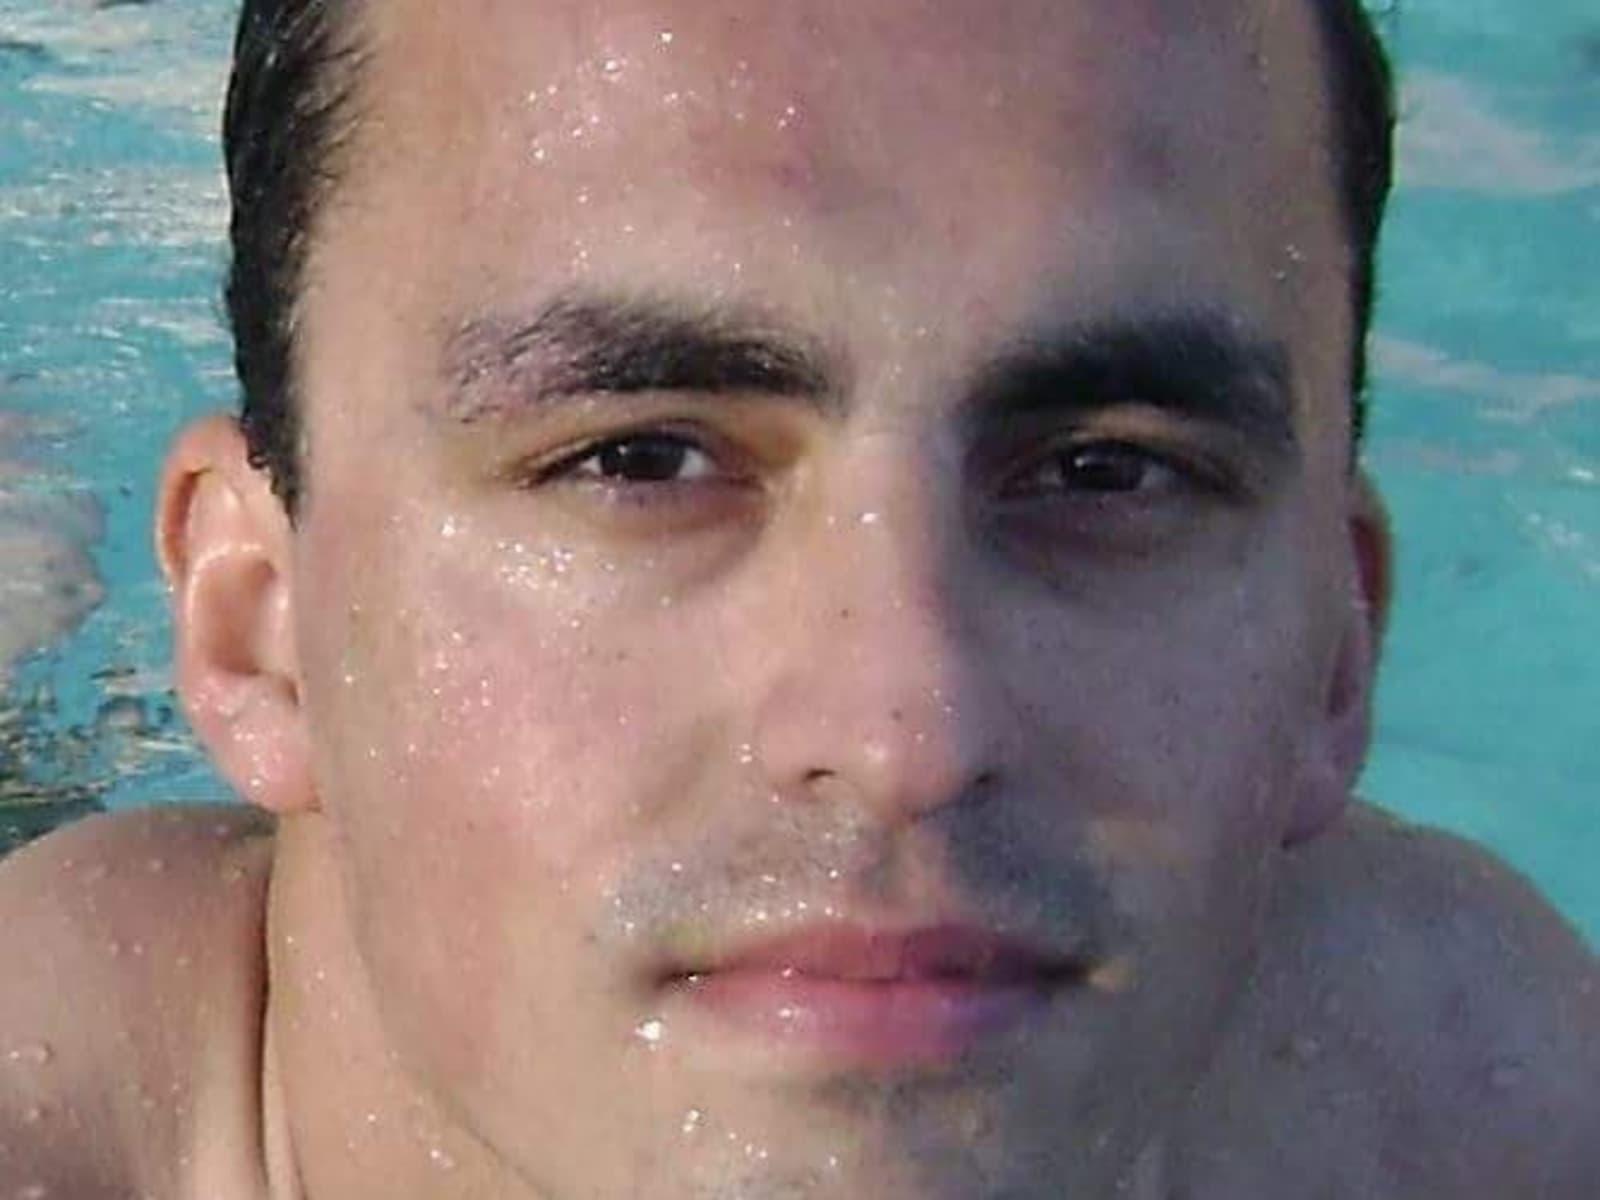 Aloisio from Curitiba, Brazil